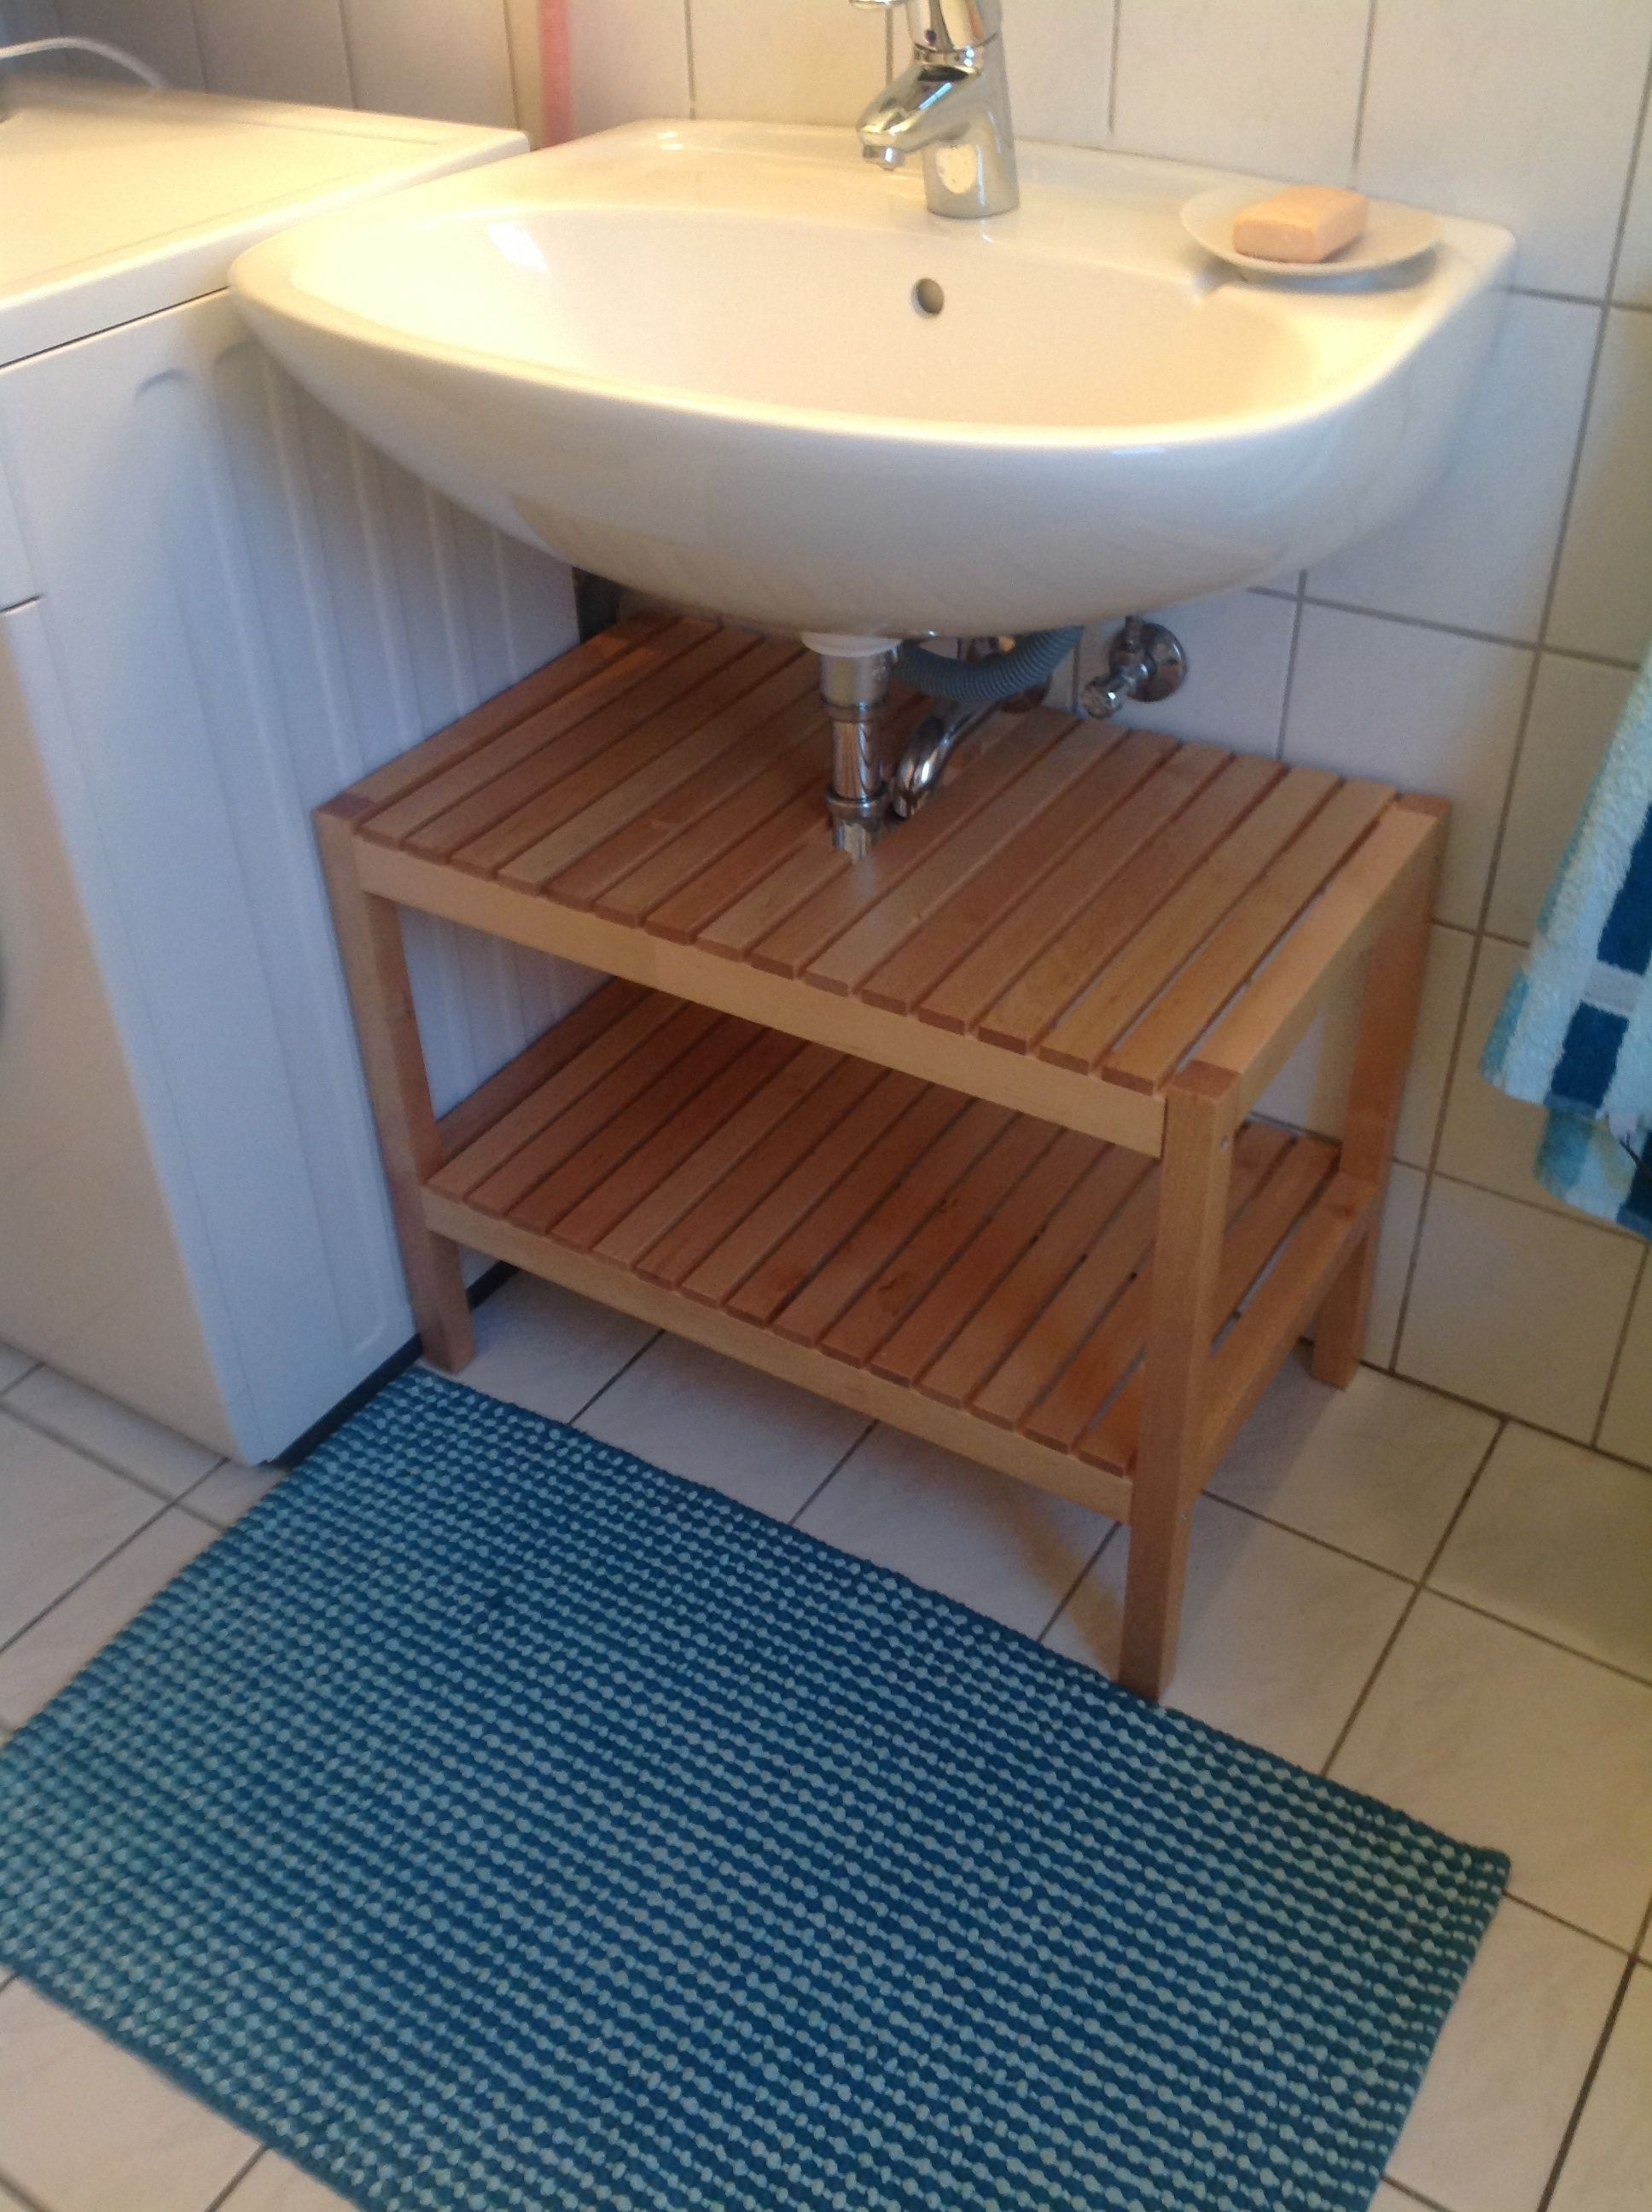 Schrank Fur Badezimmer Ikea Des Images In 2021 Kid Bathroom Decor Small Bathroom Storage Ikea Bathroom